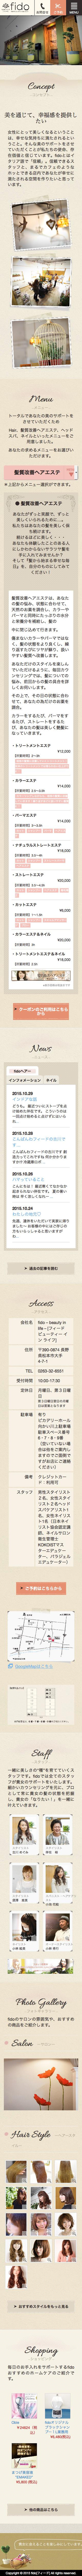 fido|松本市ヘアサロン・美容院|fidoホームページ-fido-hair.com(3)